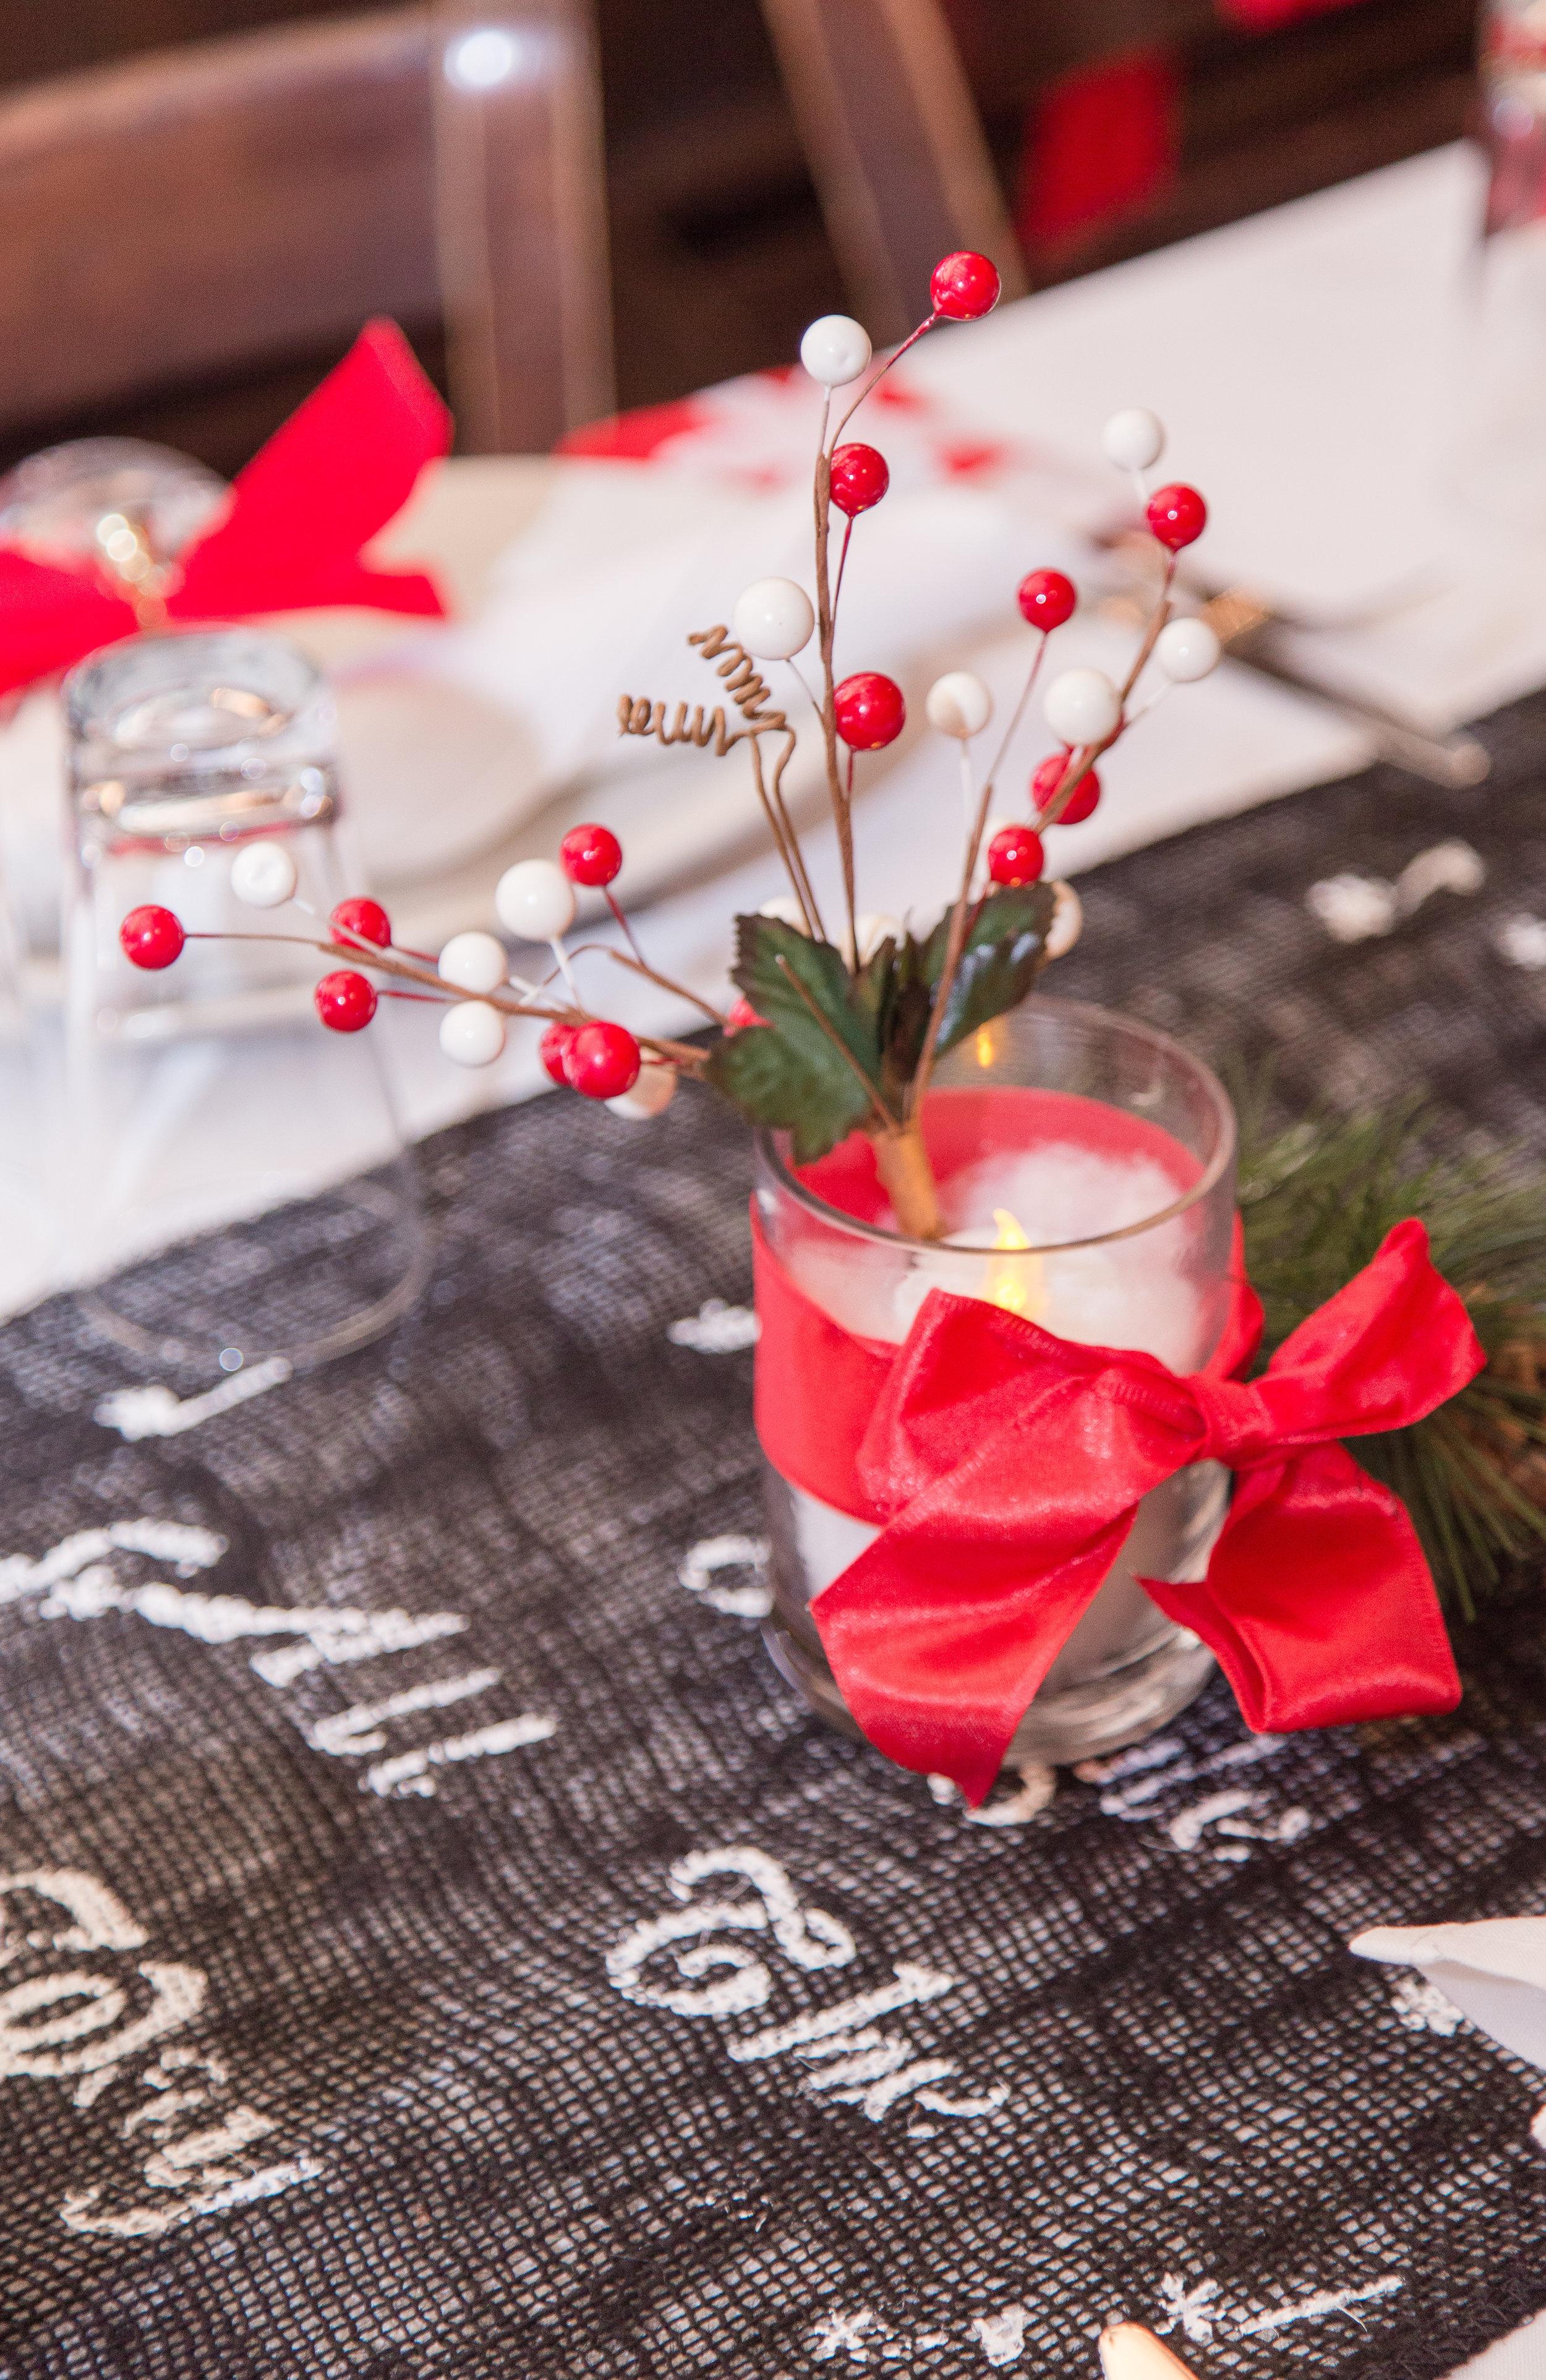 Scar-Vita-Photography-2017-Copyright-Christmas-11.jpg